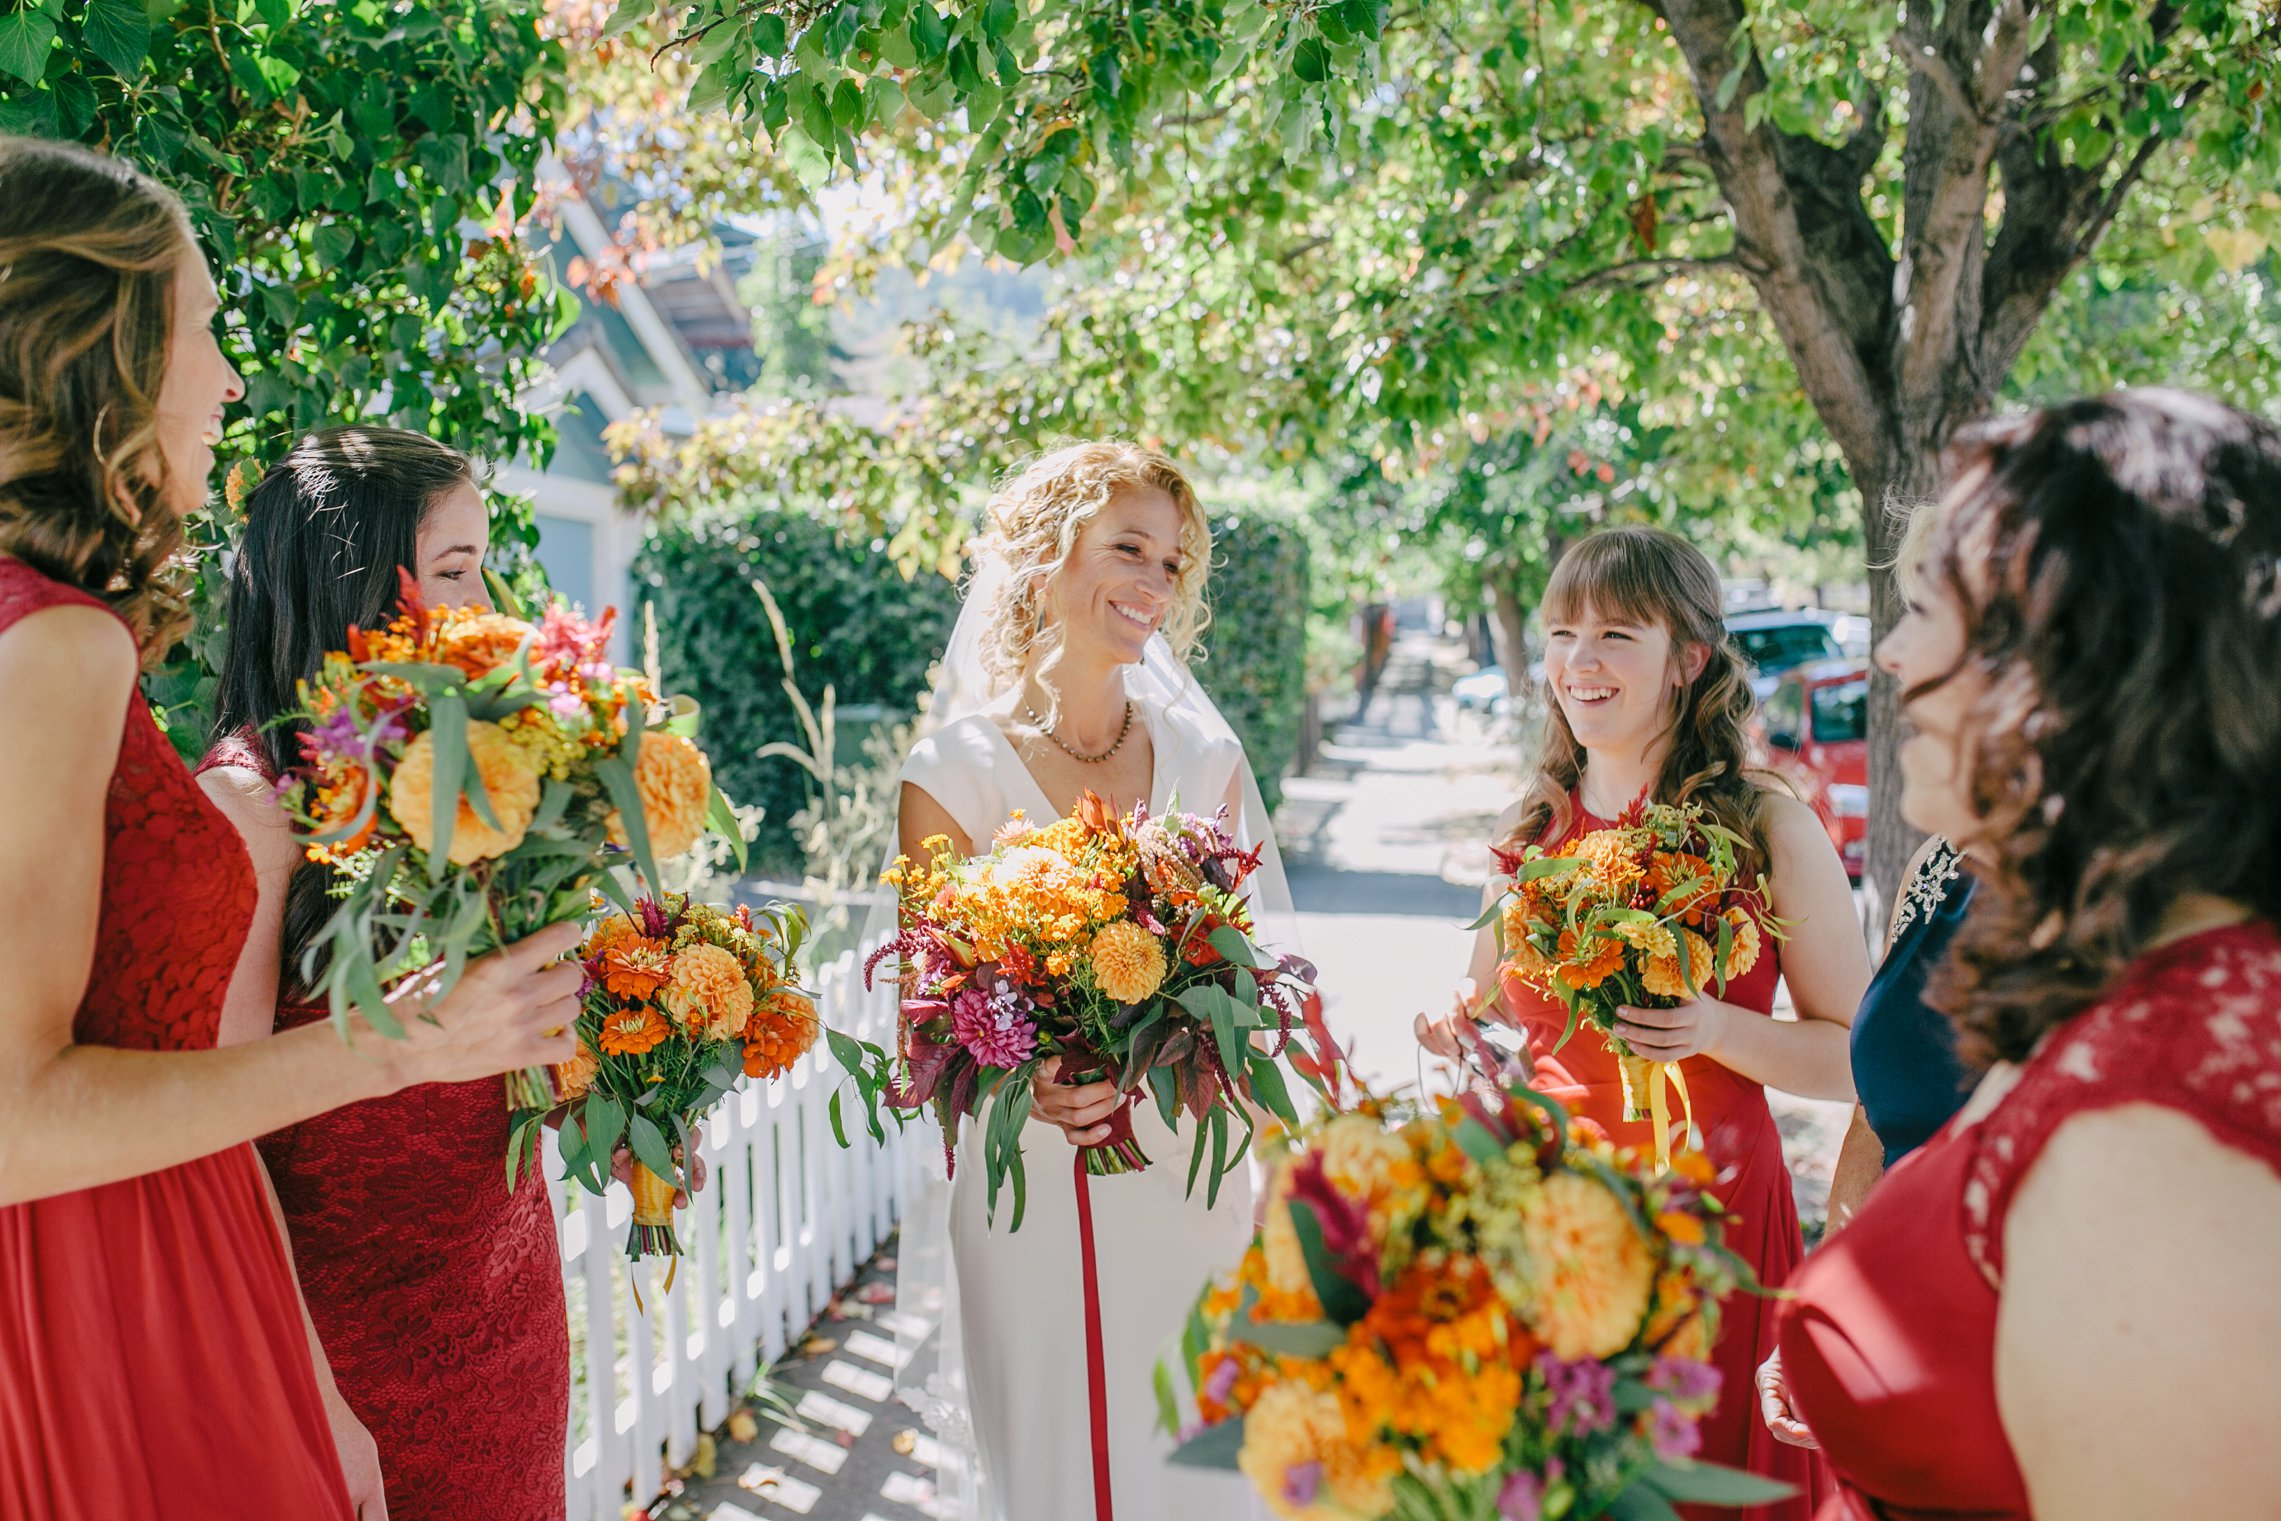 stnicholas_studio333_wedding_0002.jpg